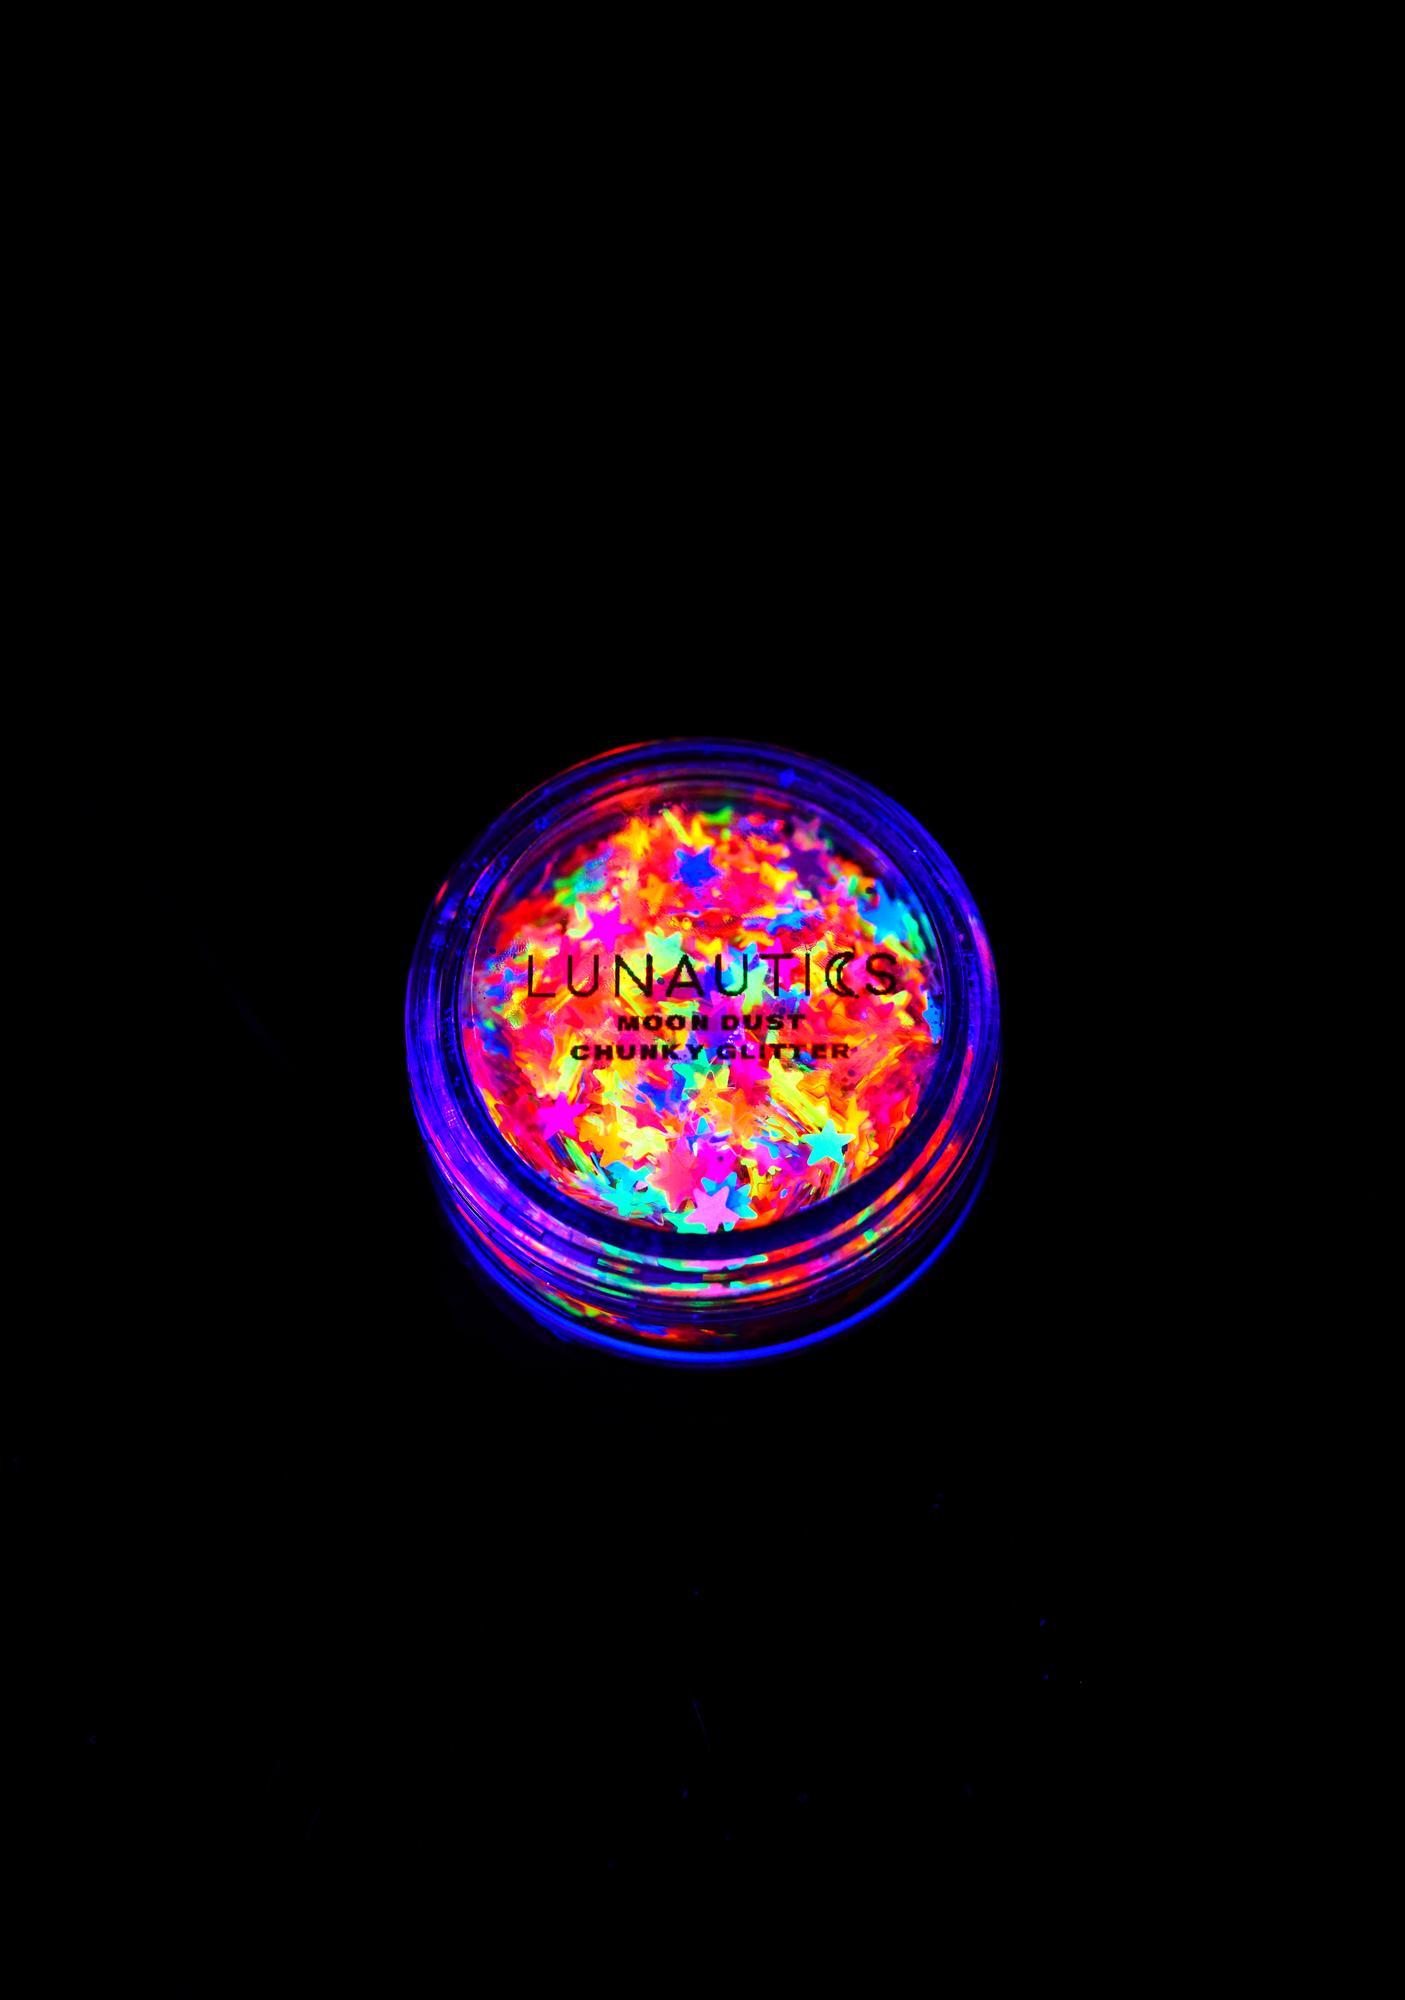 Lunautics Bomb.Com Moon Dust Glitter